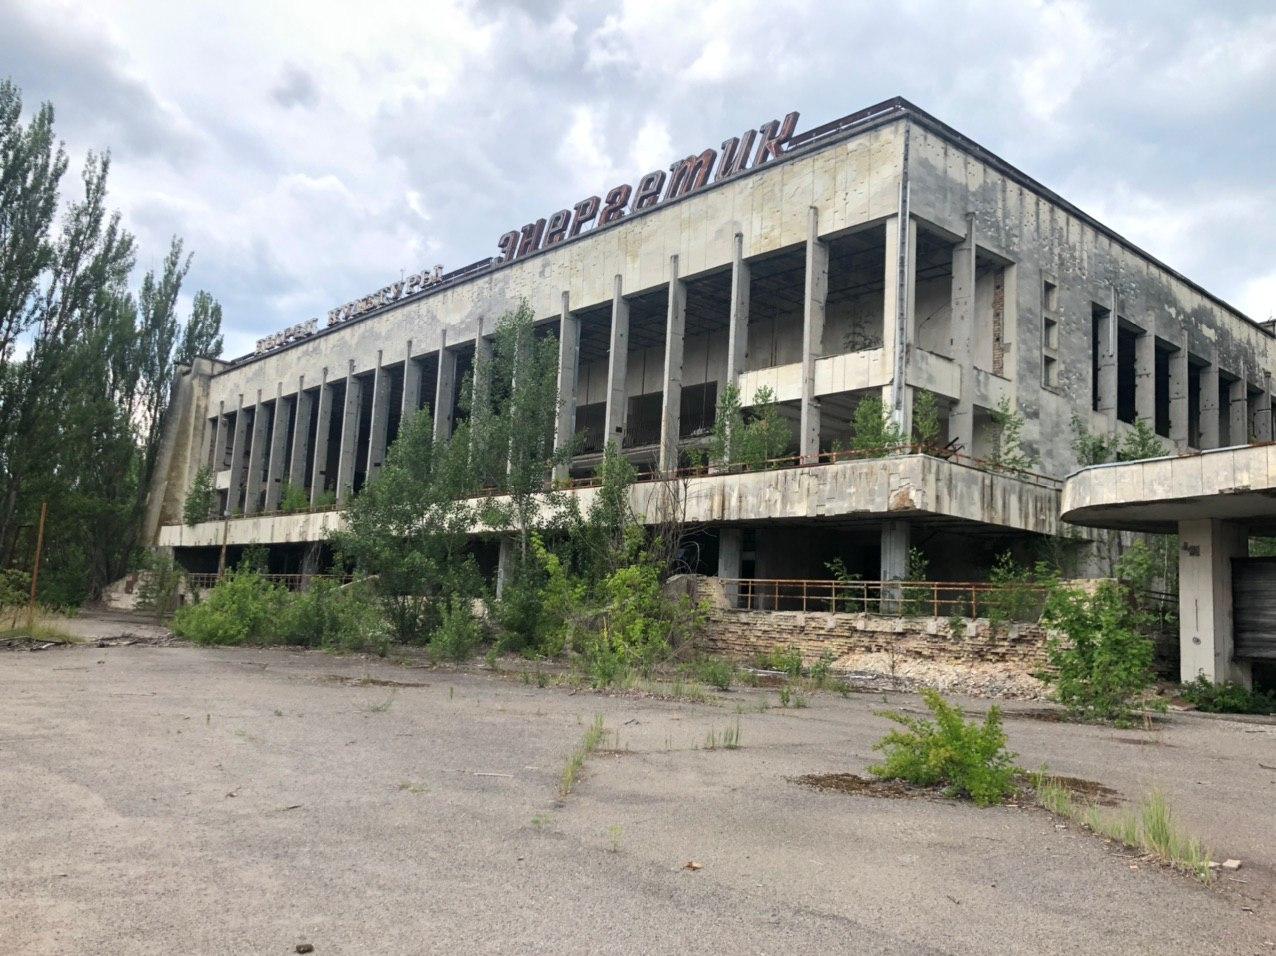 is chernobyl safe to visit 2020